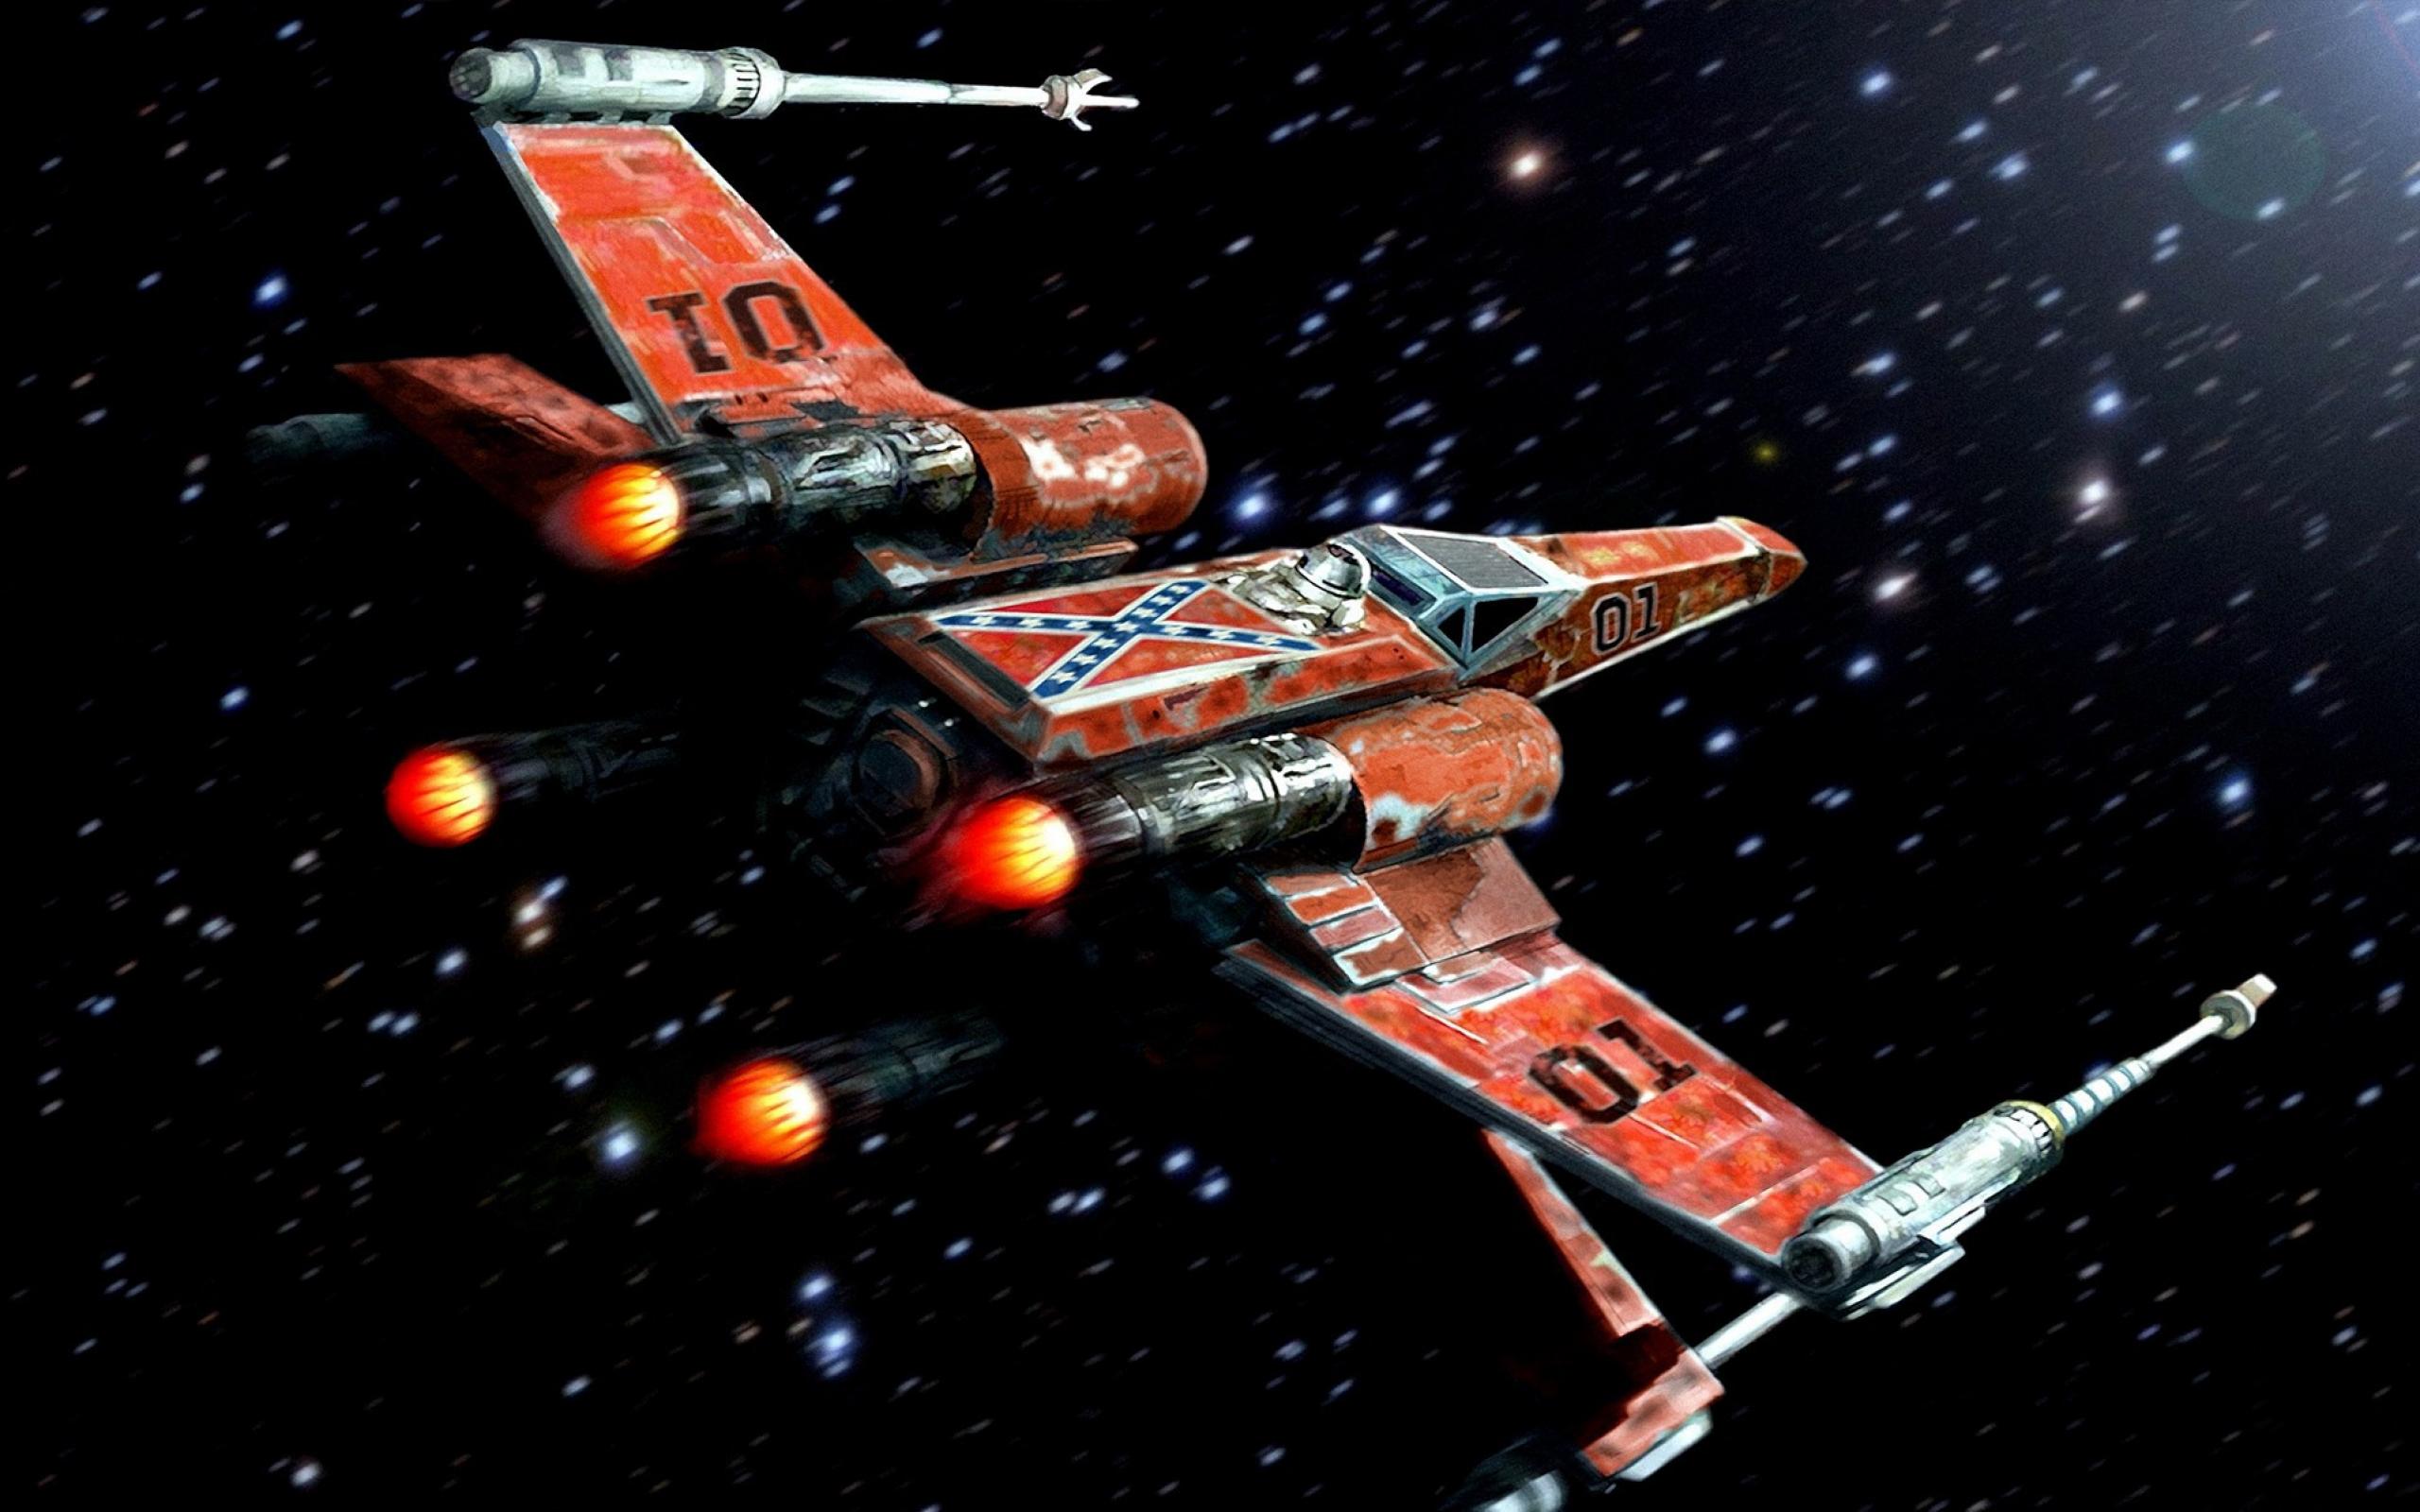 Download 2560x1600 Rebel Alliance X Wing Star Wars Traitor